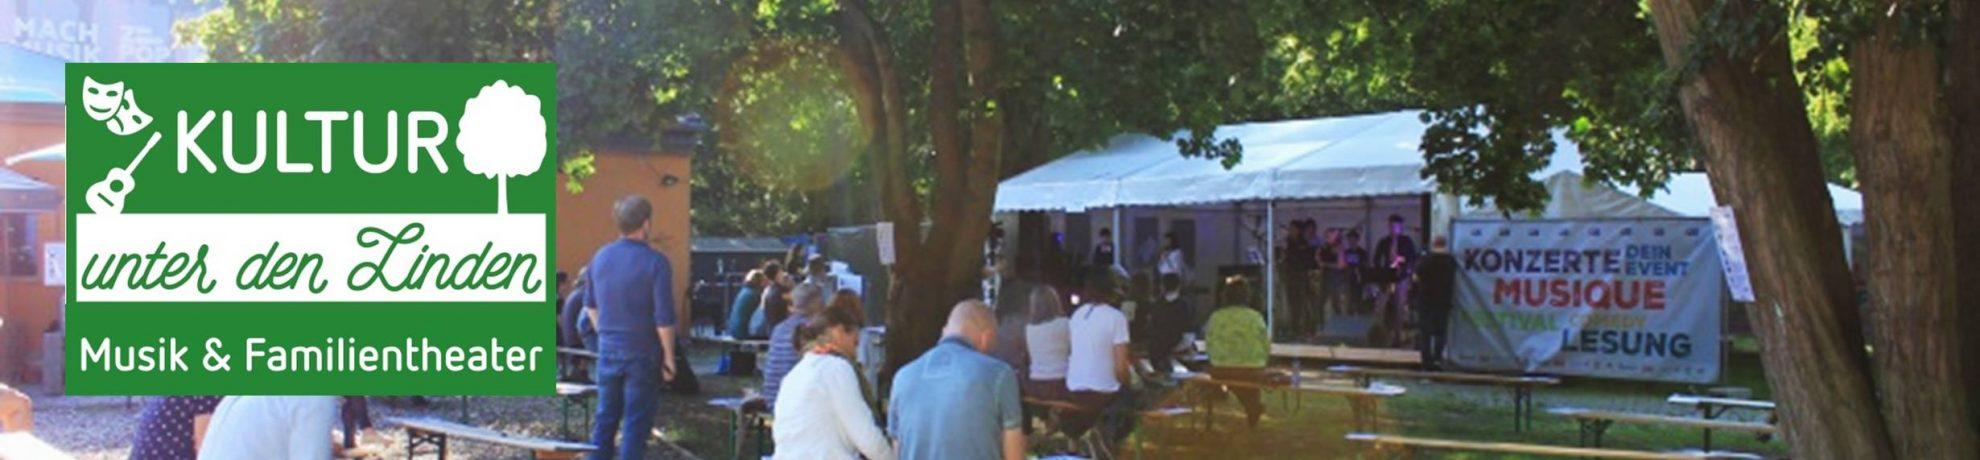 Kultur unter den Linden im Lindenpark